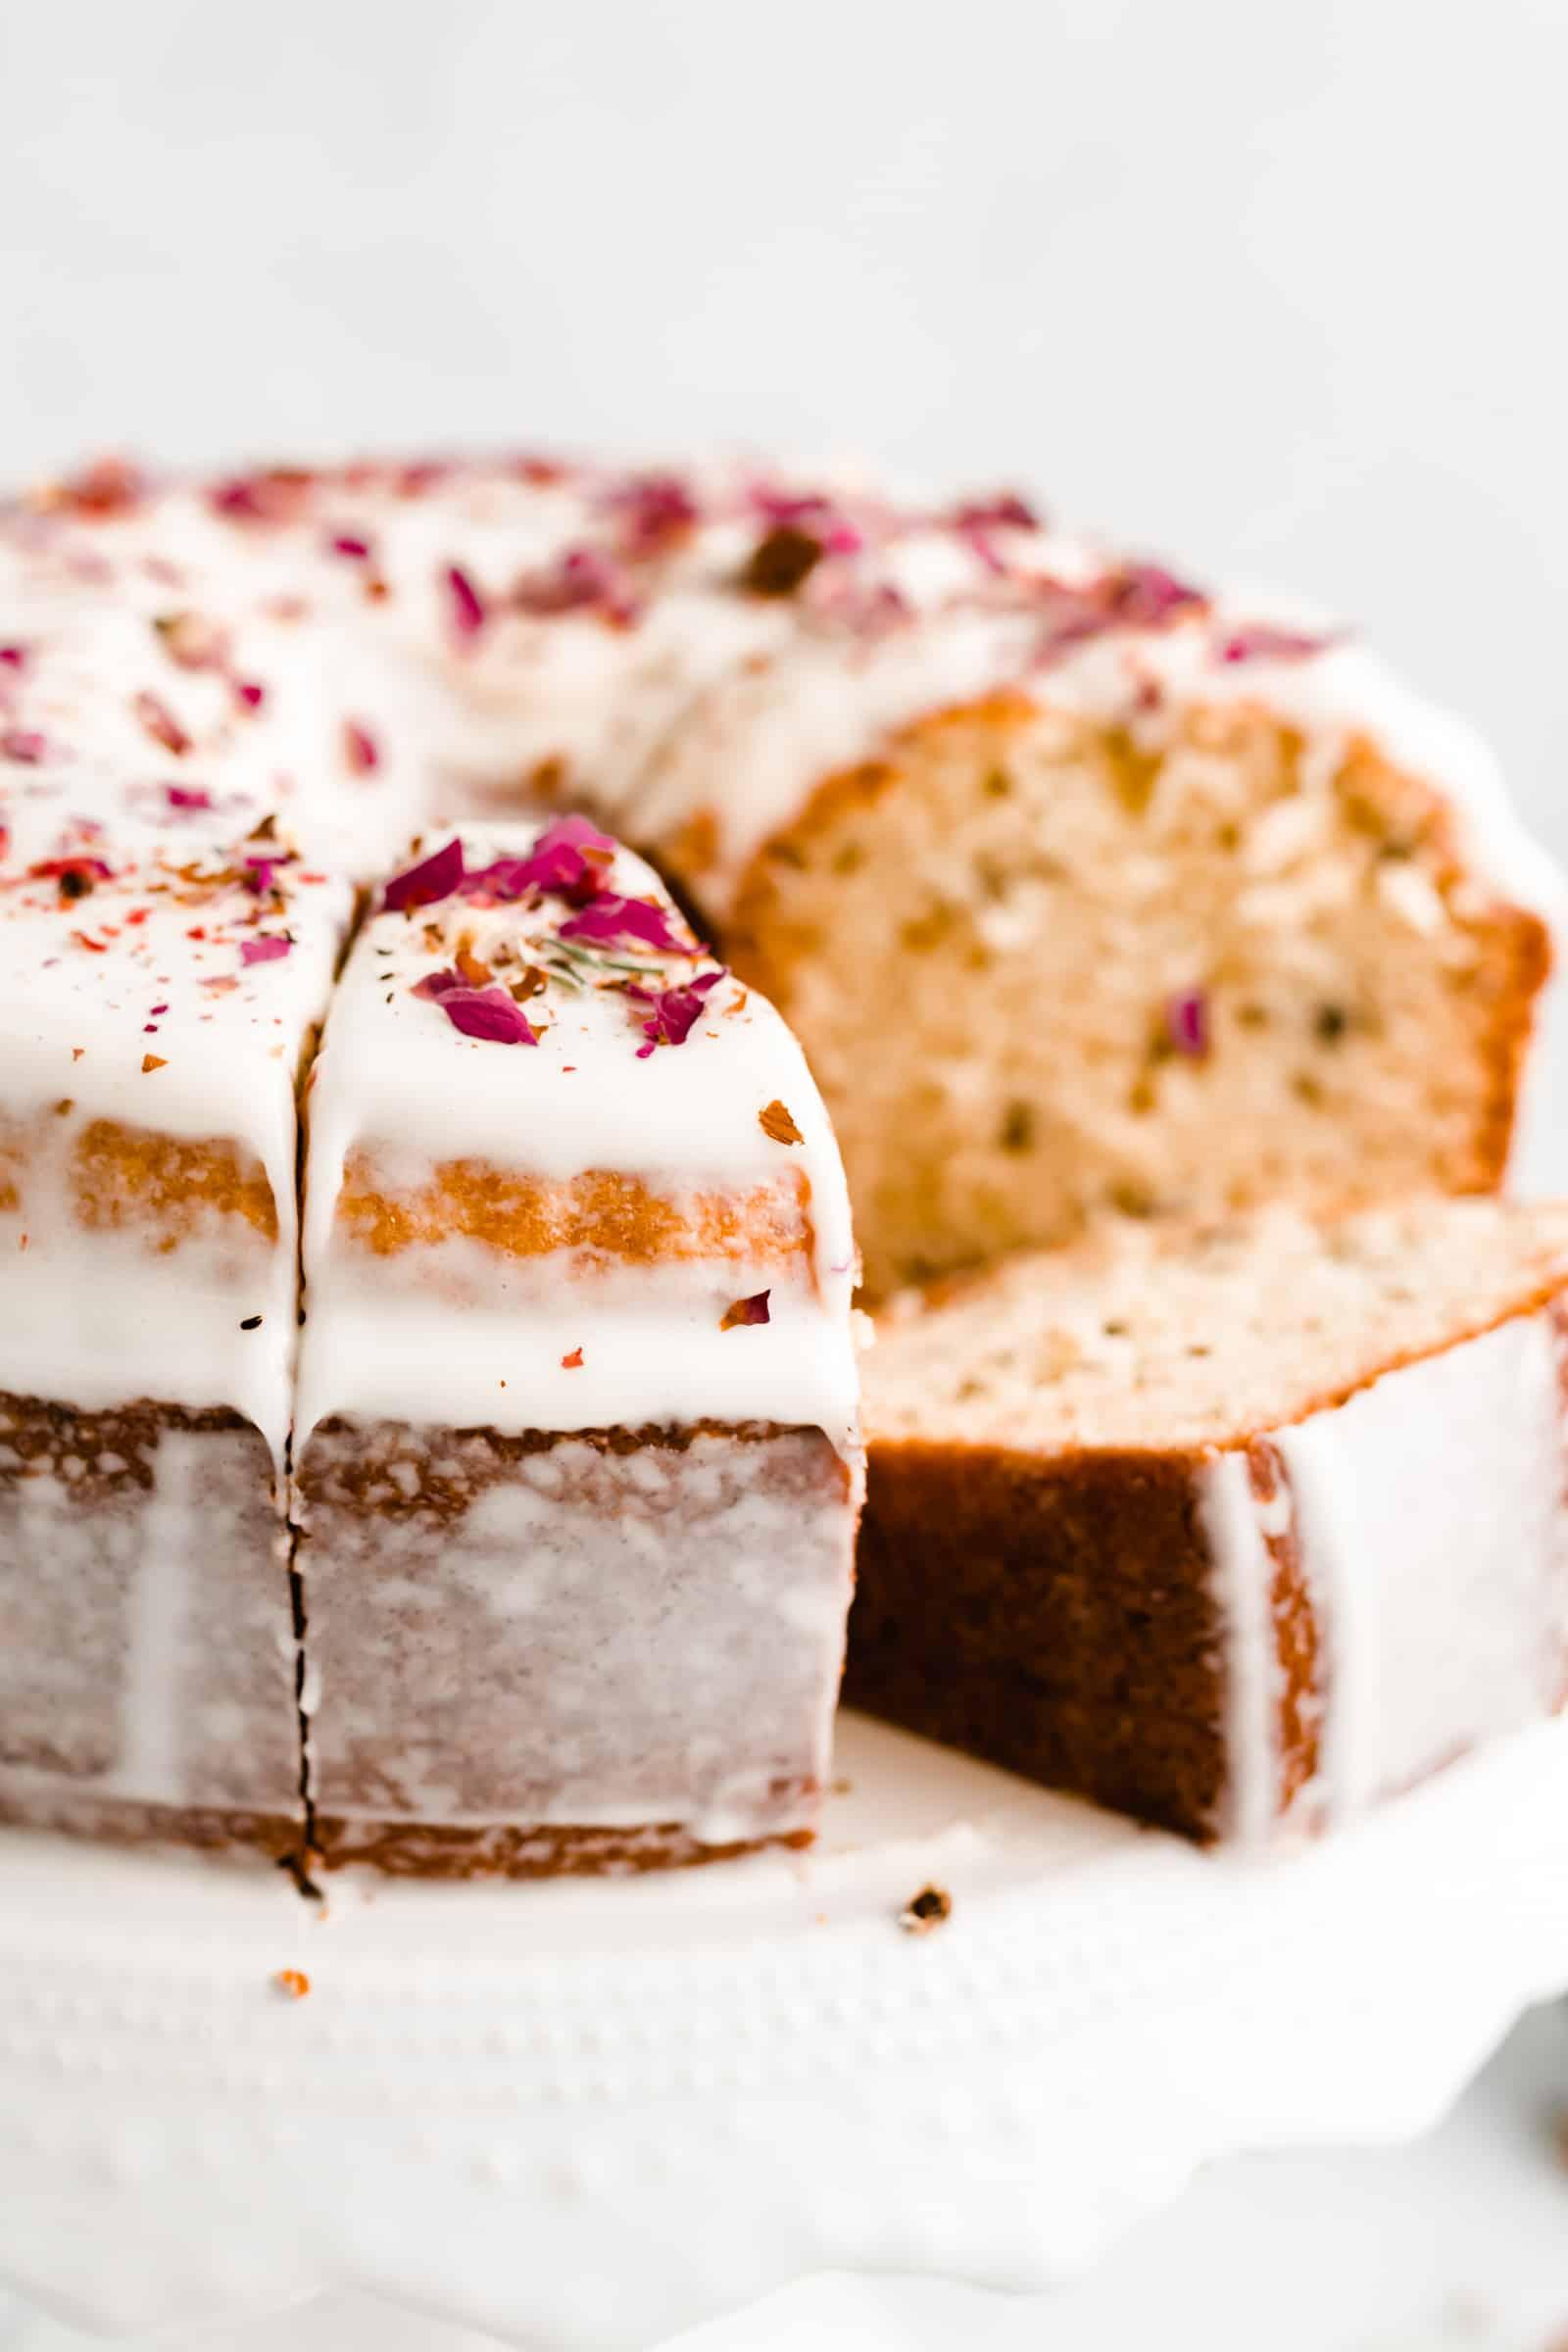 Rose Cake with Cream Cheese Glaze